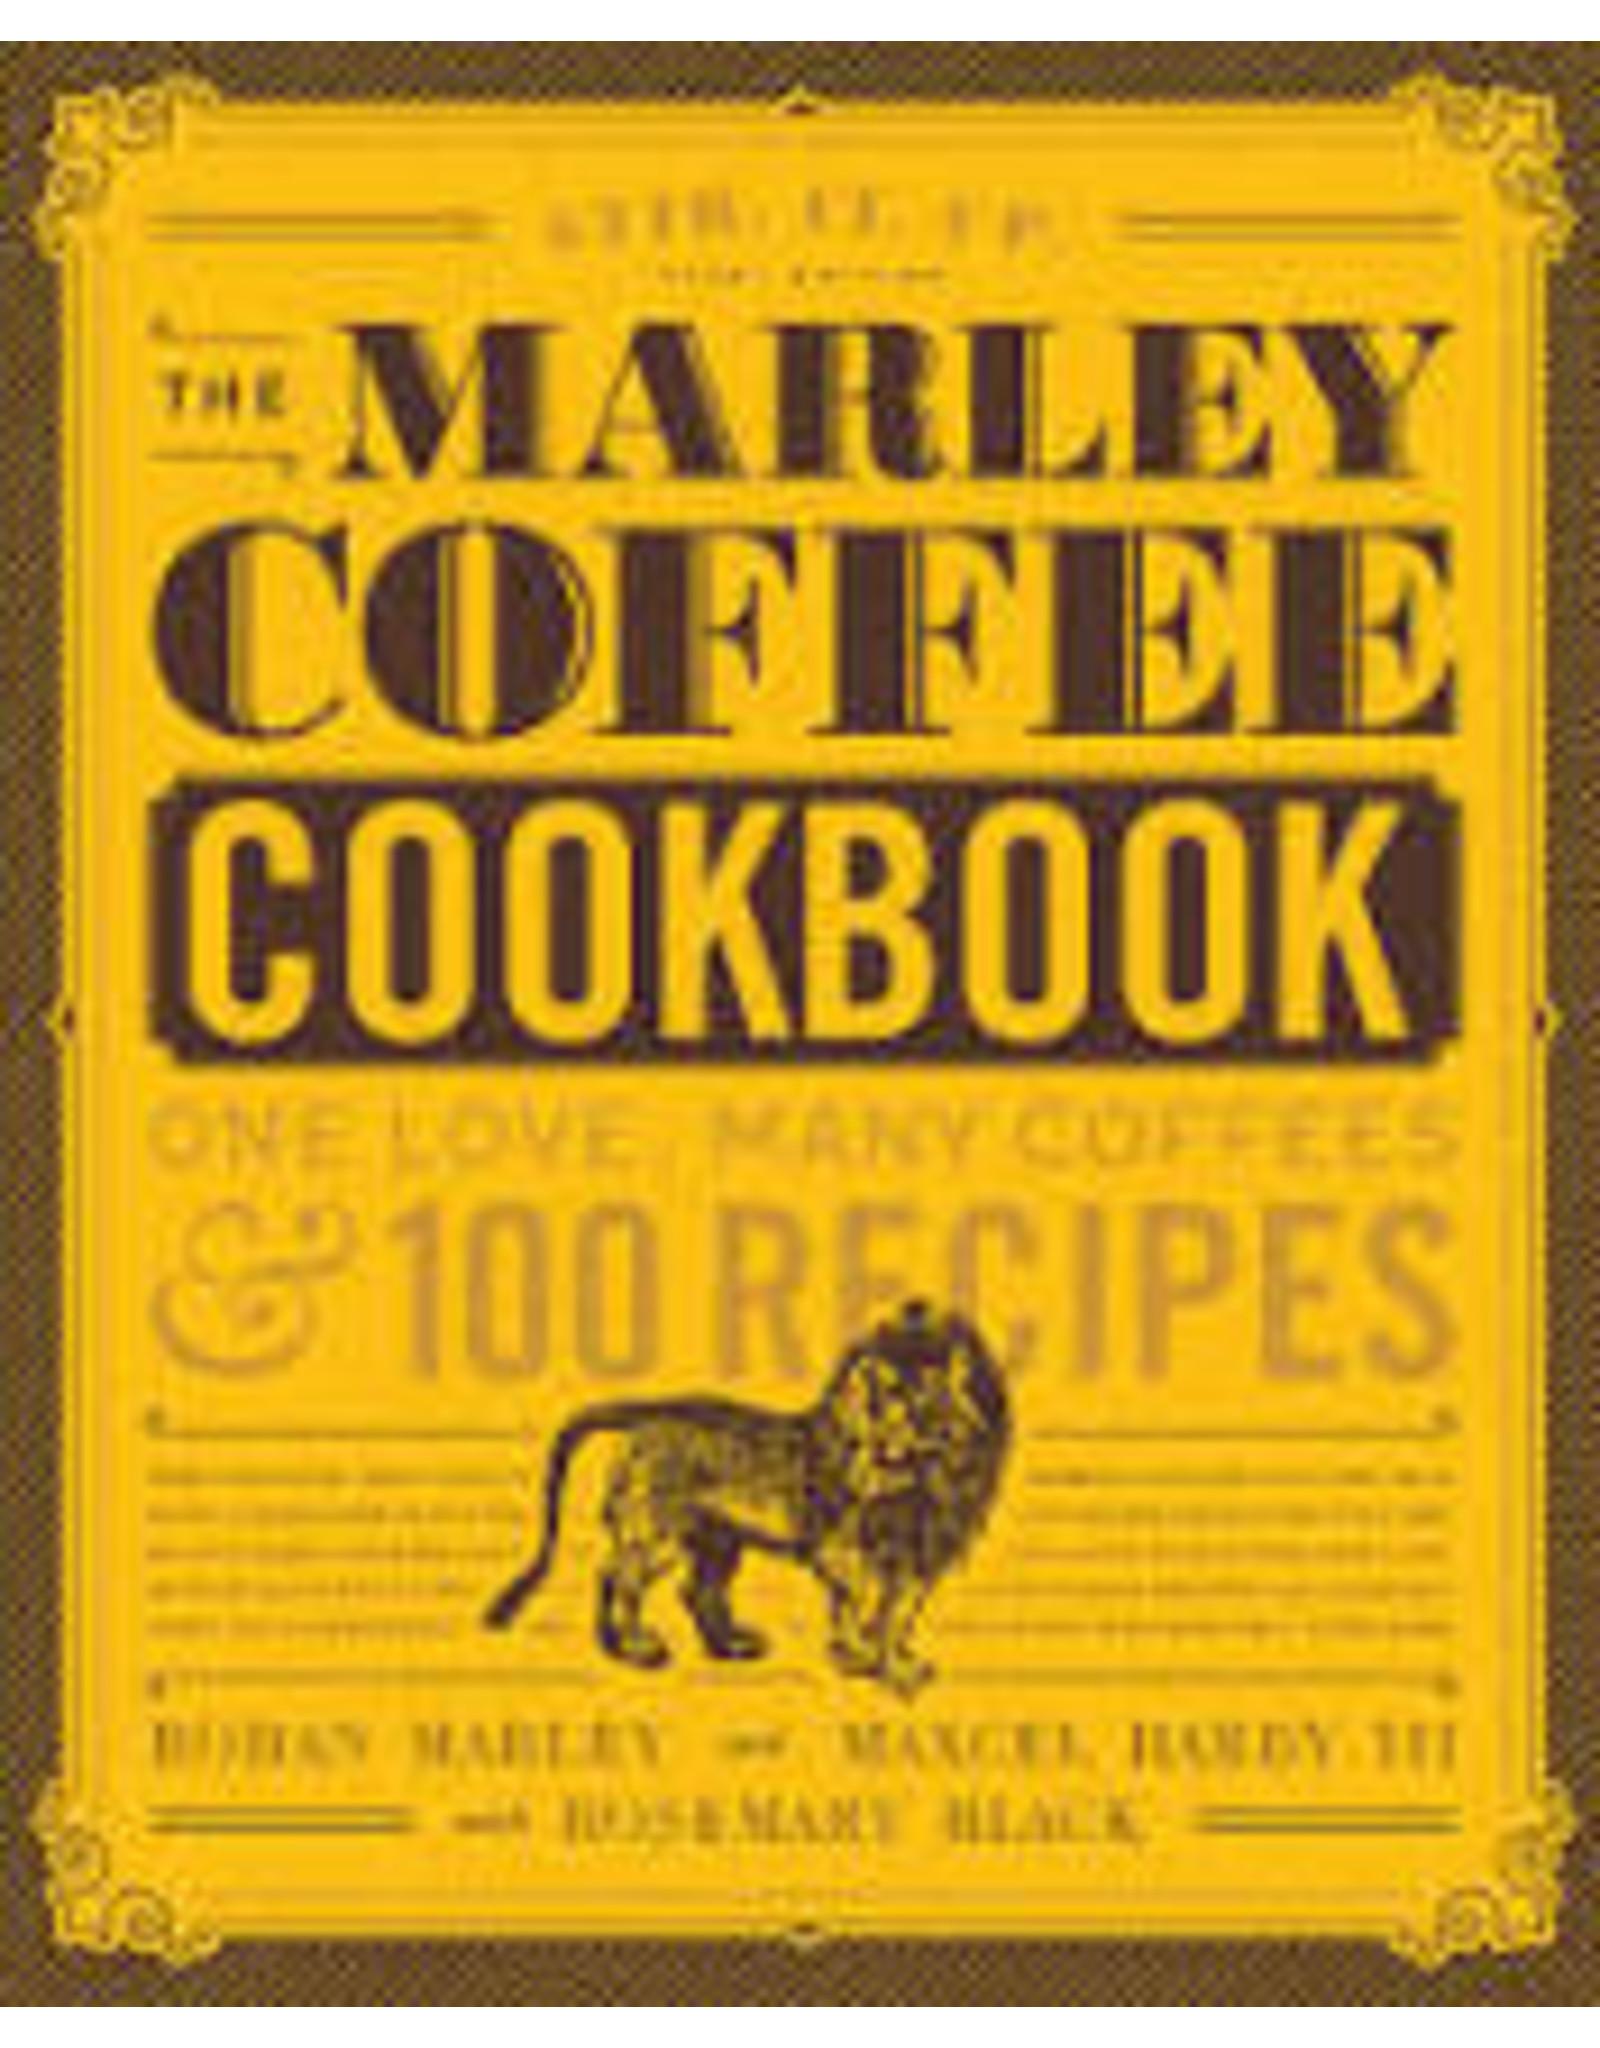 Books The Marley Coffee Cookbook by Rohan Marley and Maxcel Hardy III